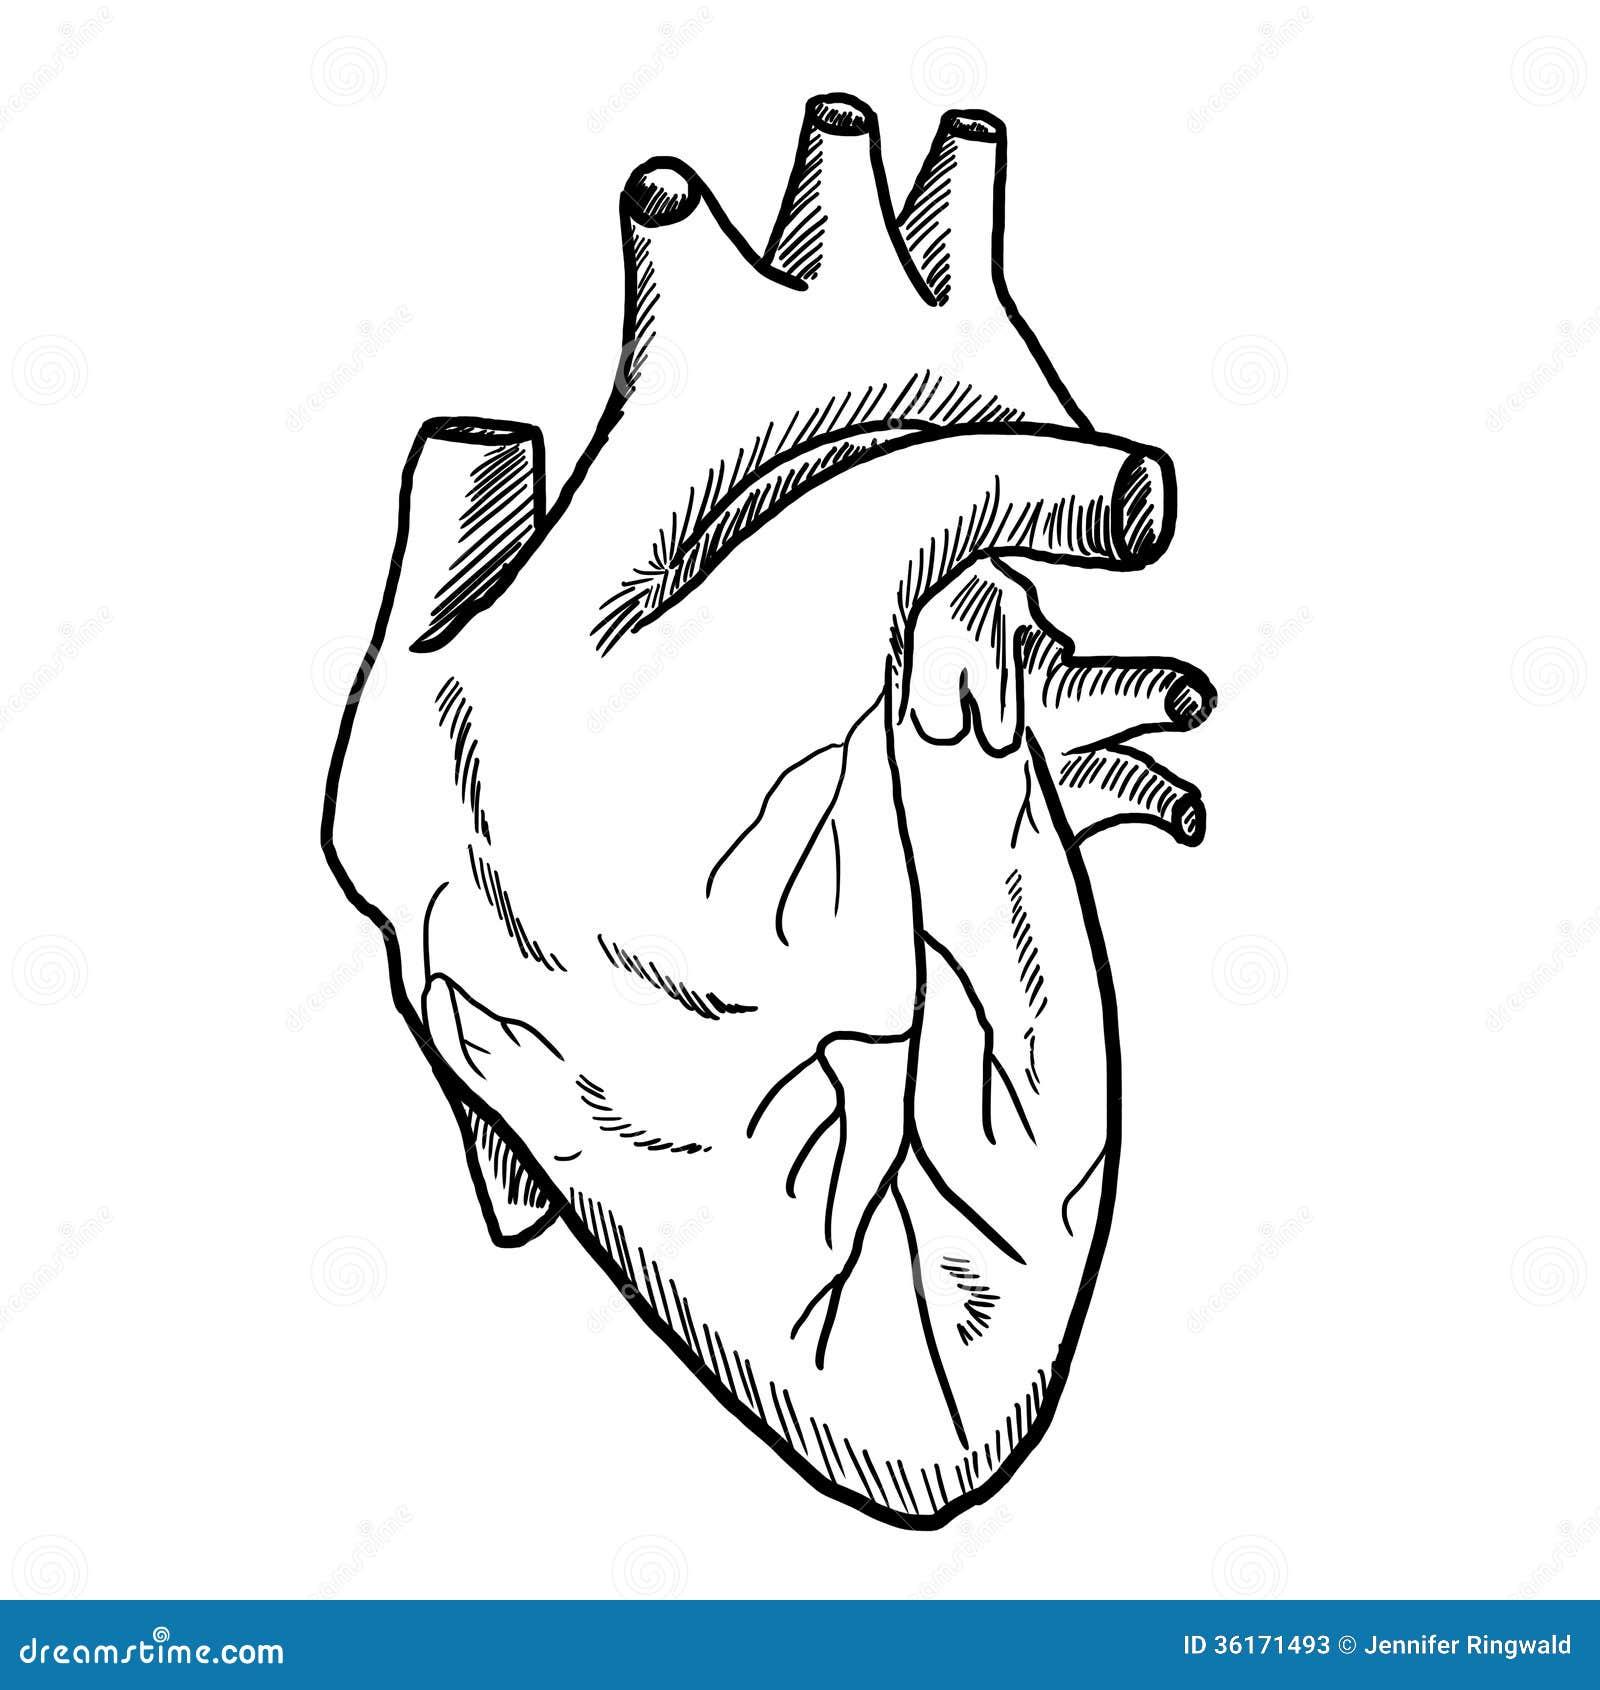 Desenho Do Coracao Humano Ilustracao Stock Ilustracao De